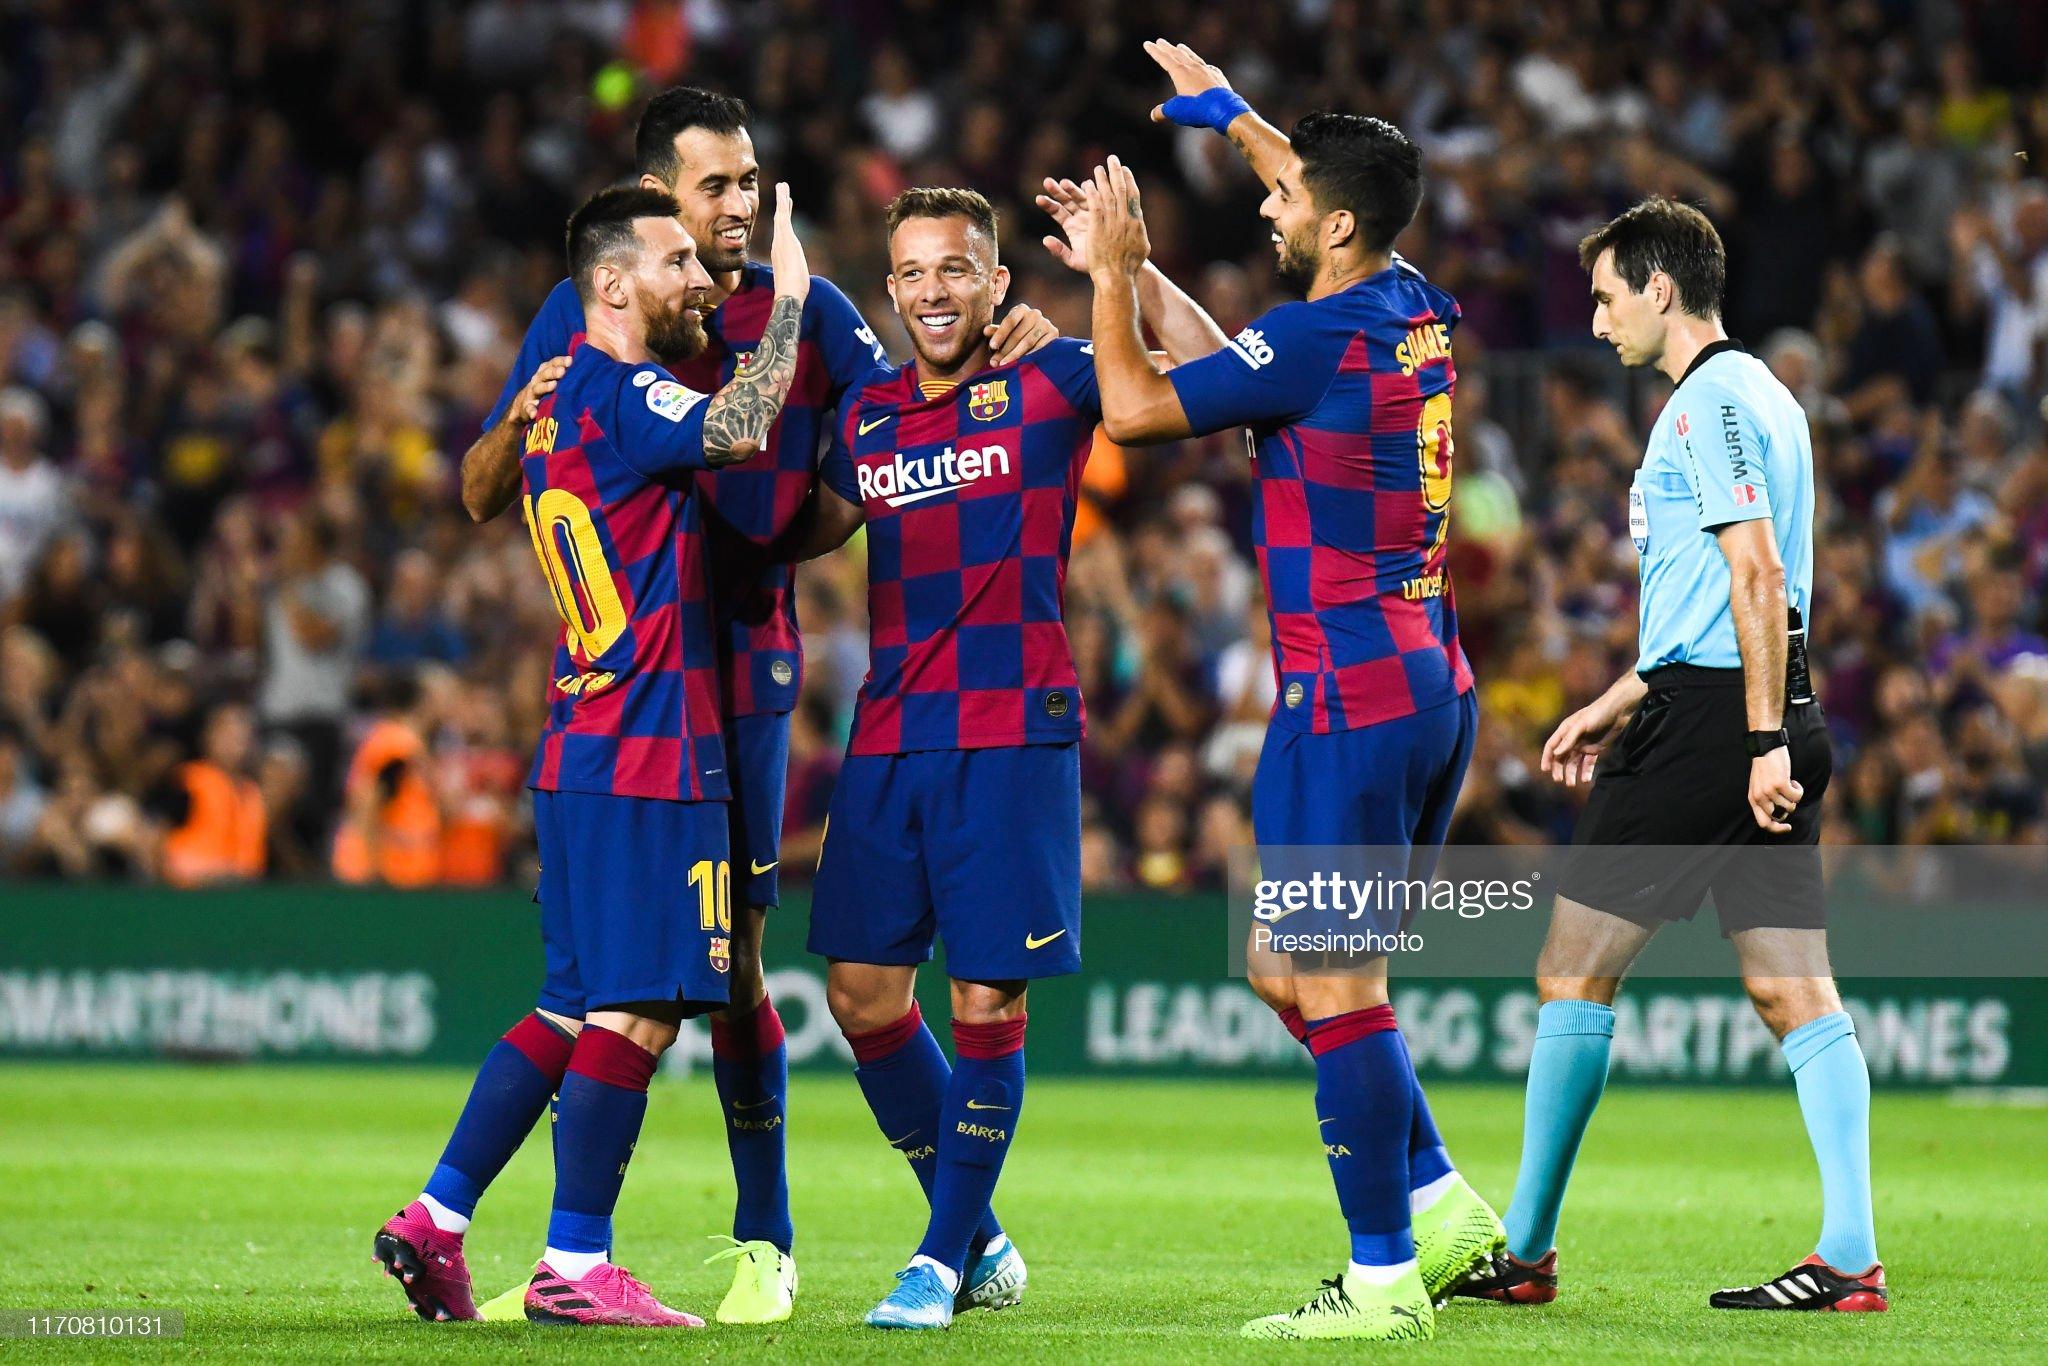 صور مباراة : برشلونة - فياريال 2-1 ( 24-09-2019 )  Arthur-melo-of-fc-barcelona-celebrates-his-goal-with-his-teammates-picture-id1170810131?s=2048x2048